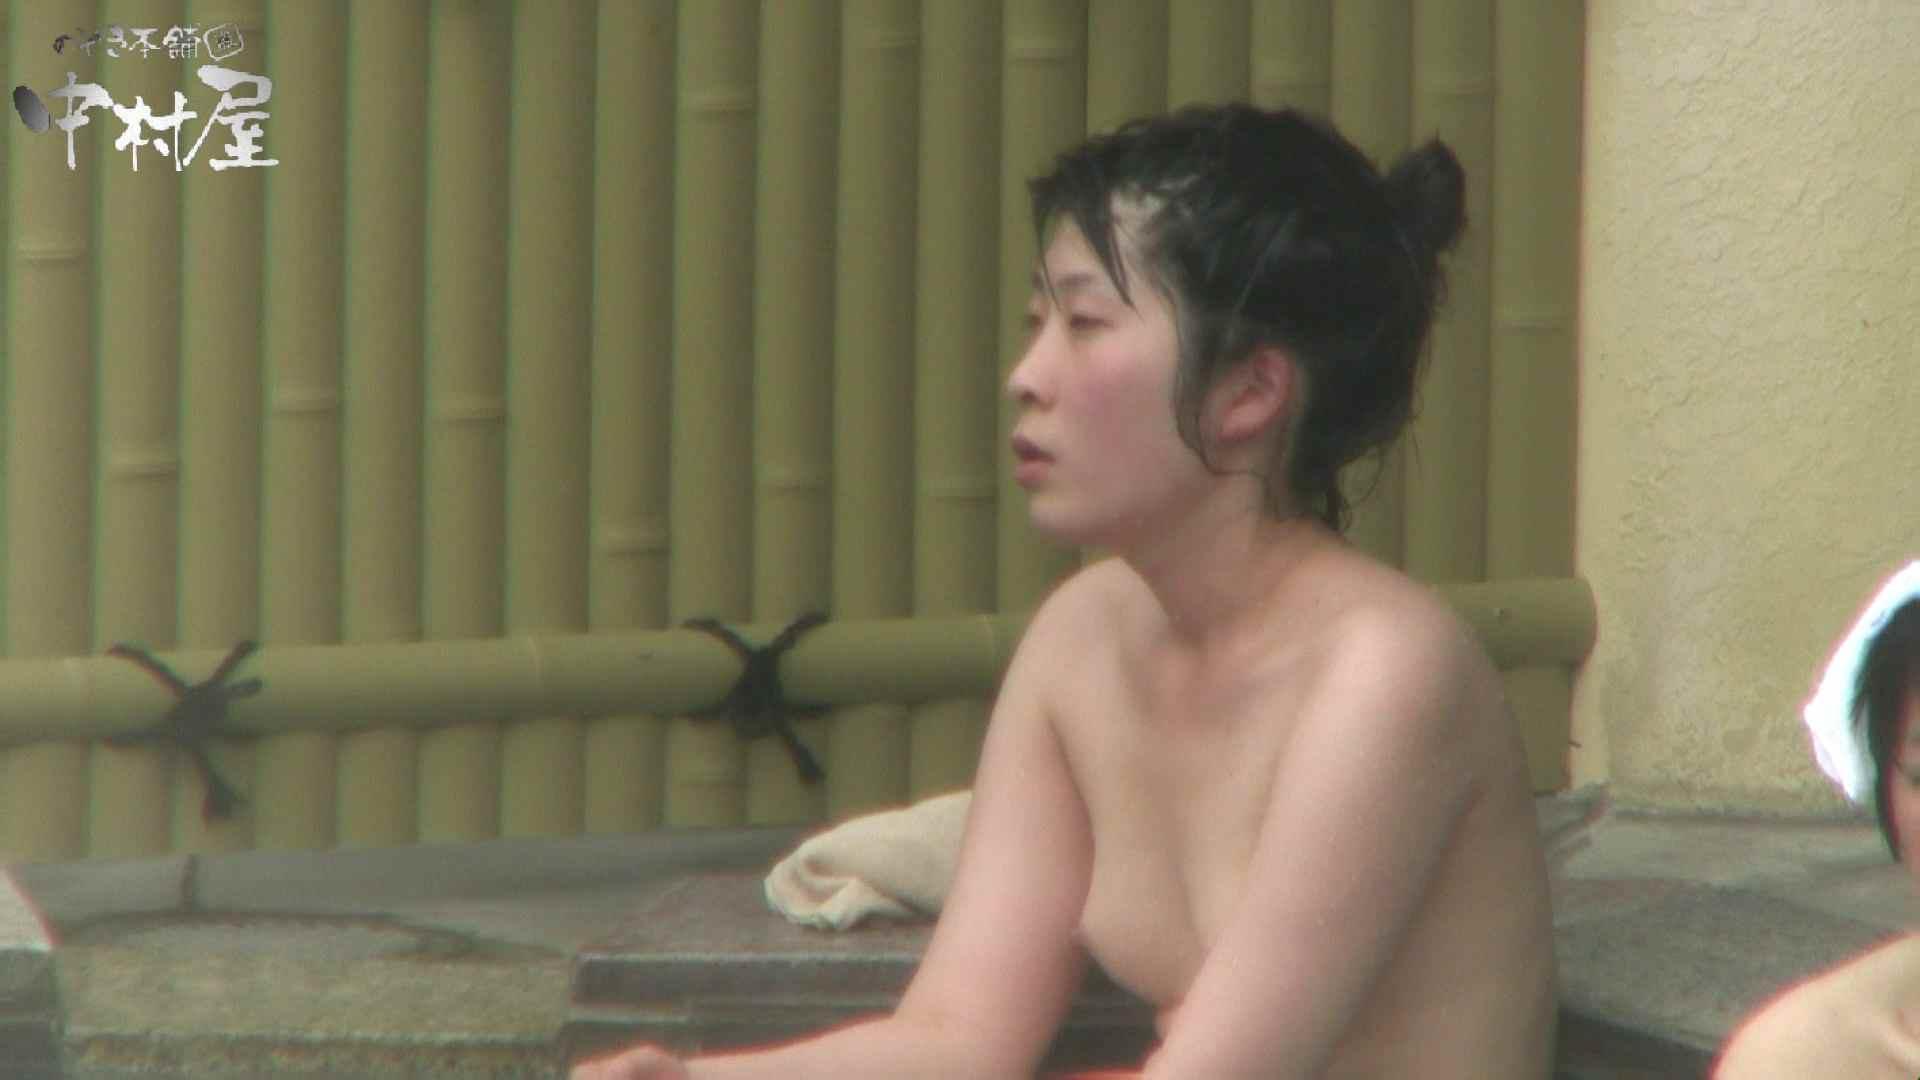 Aquaな露天風呂Vol.955 盗撮師作品 | 露天風呂突入  85pic 61